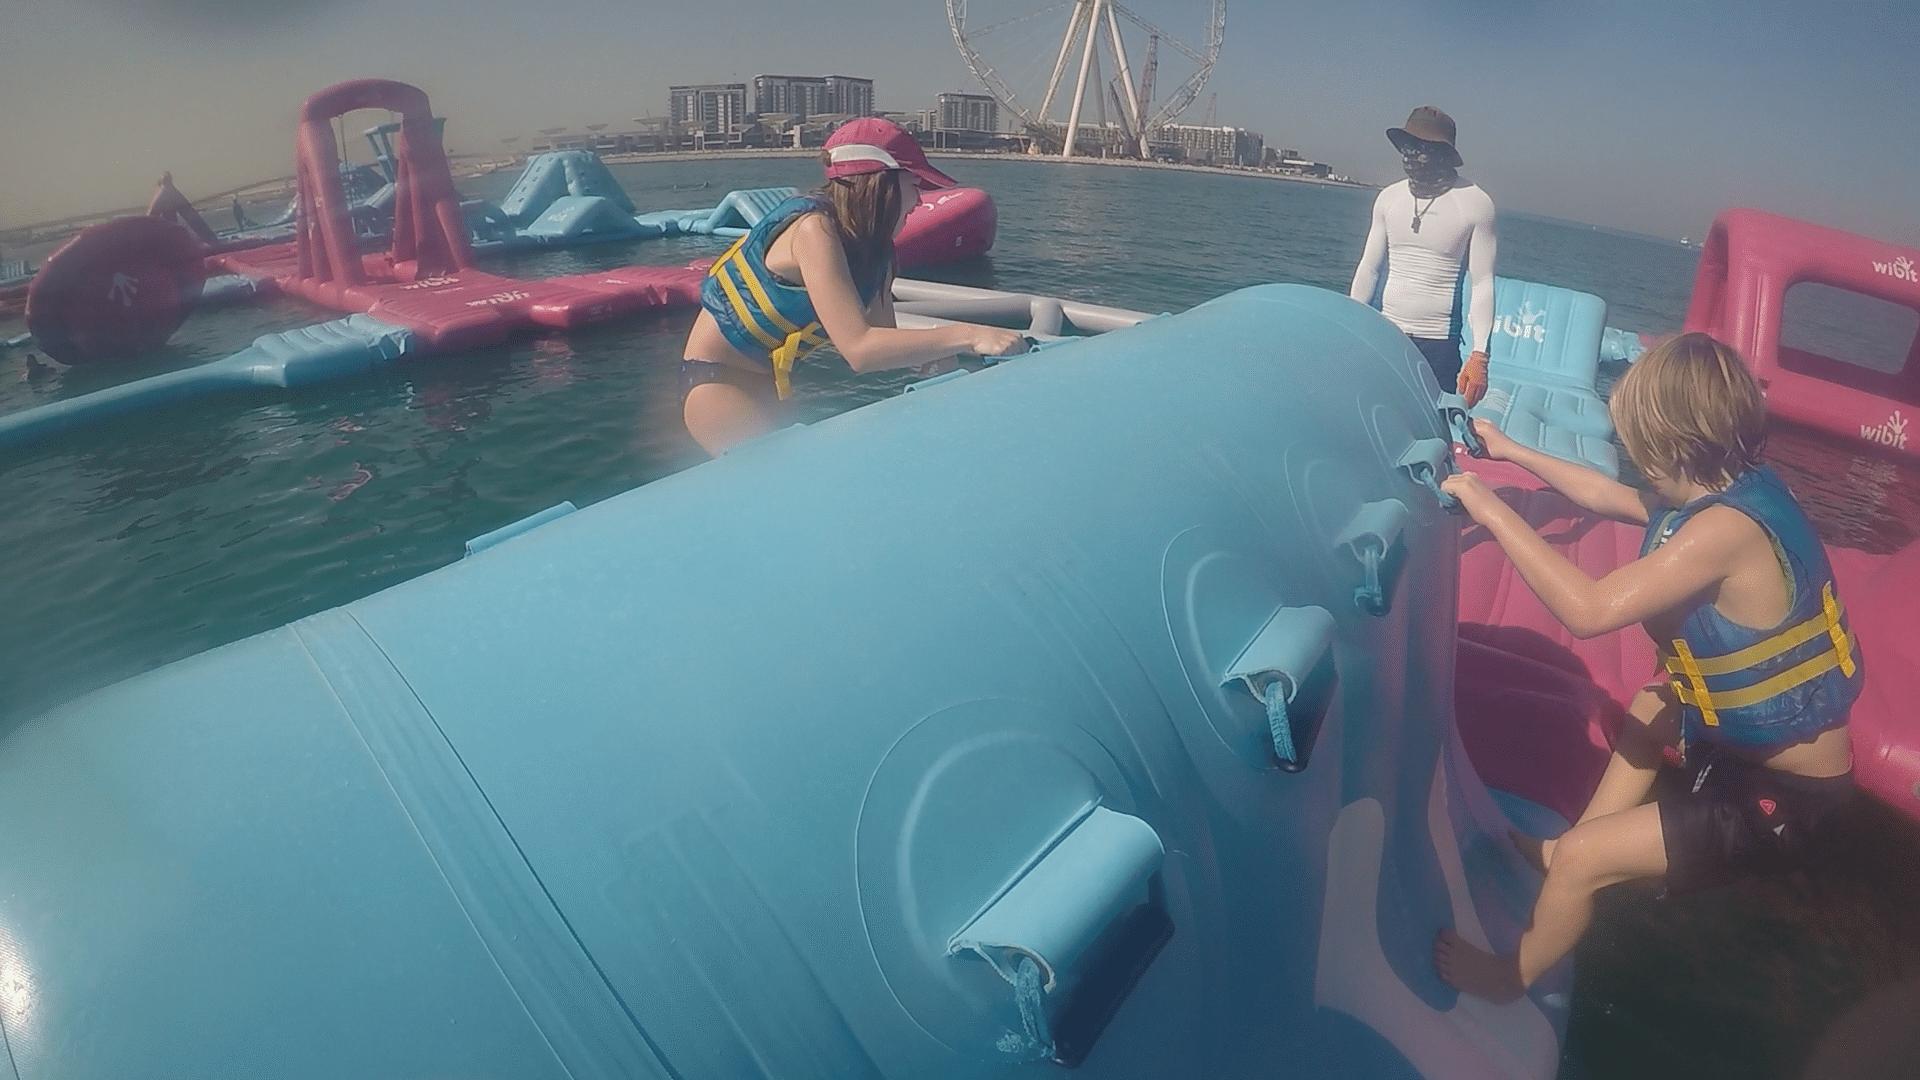 Aqua Fun I Dubai V 228 Rldens St 246 Rsta Hinderbana P 229 Vatten